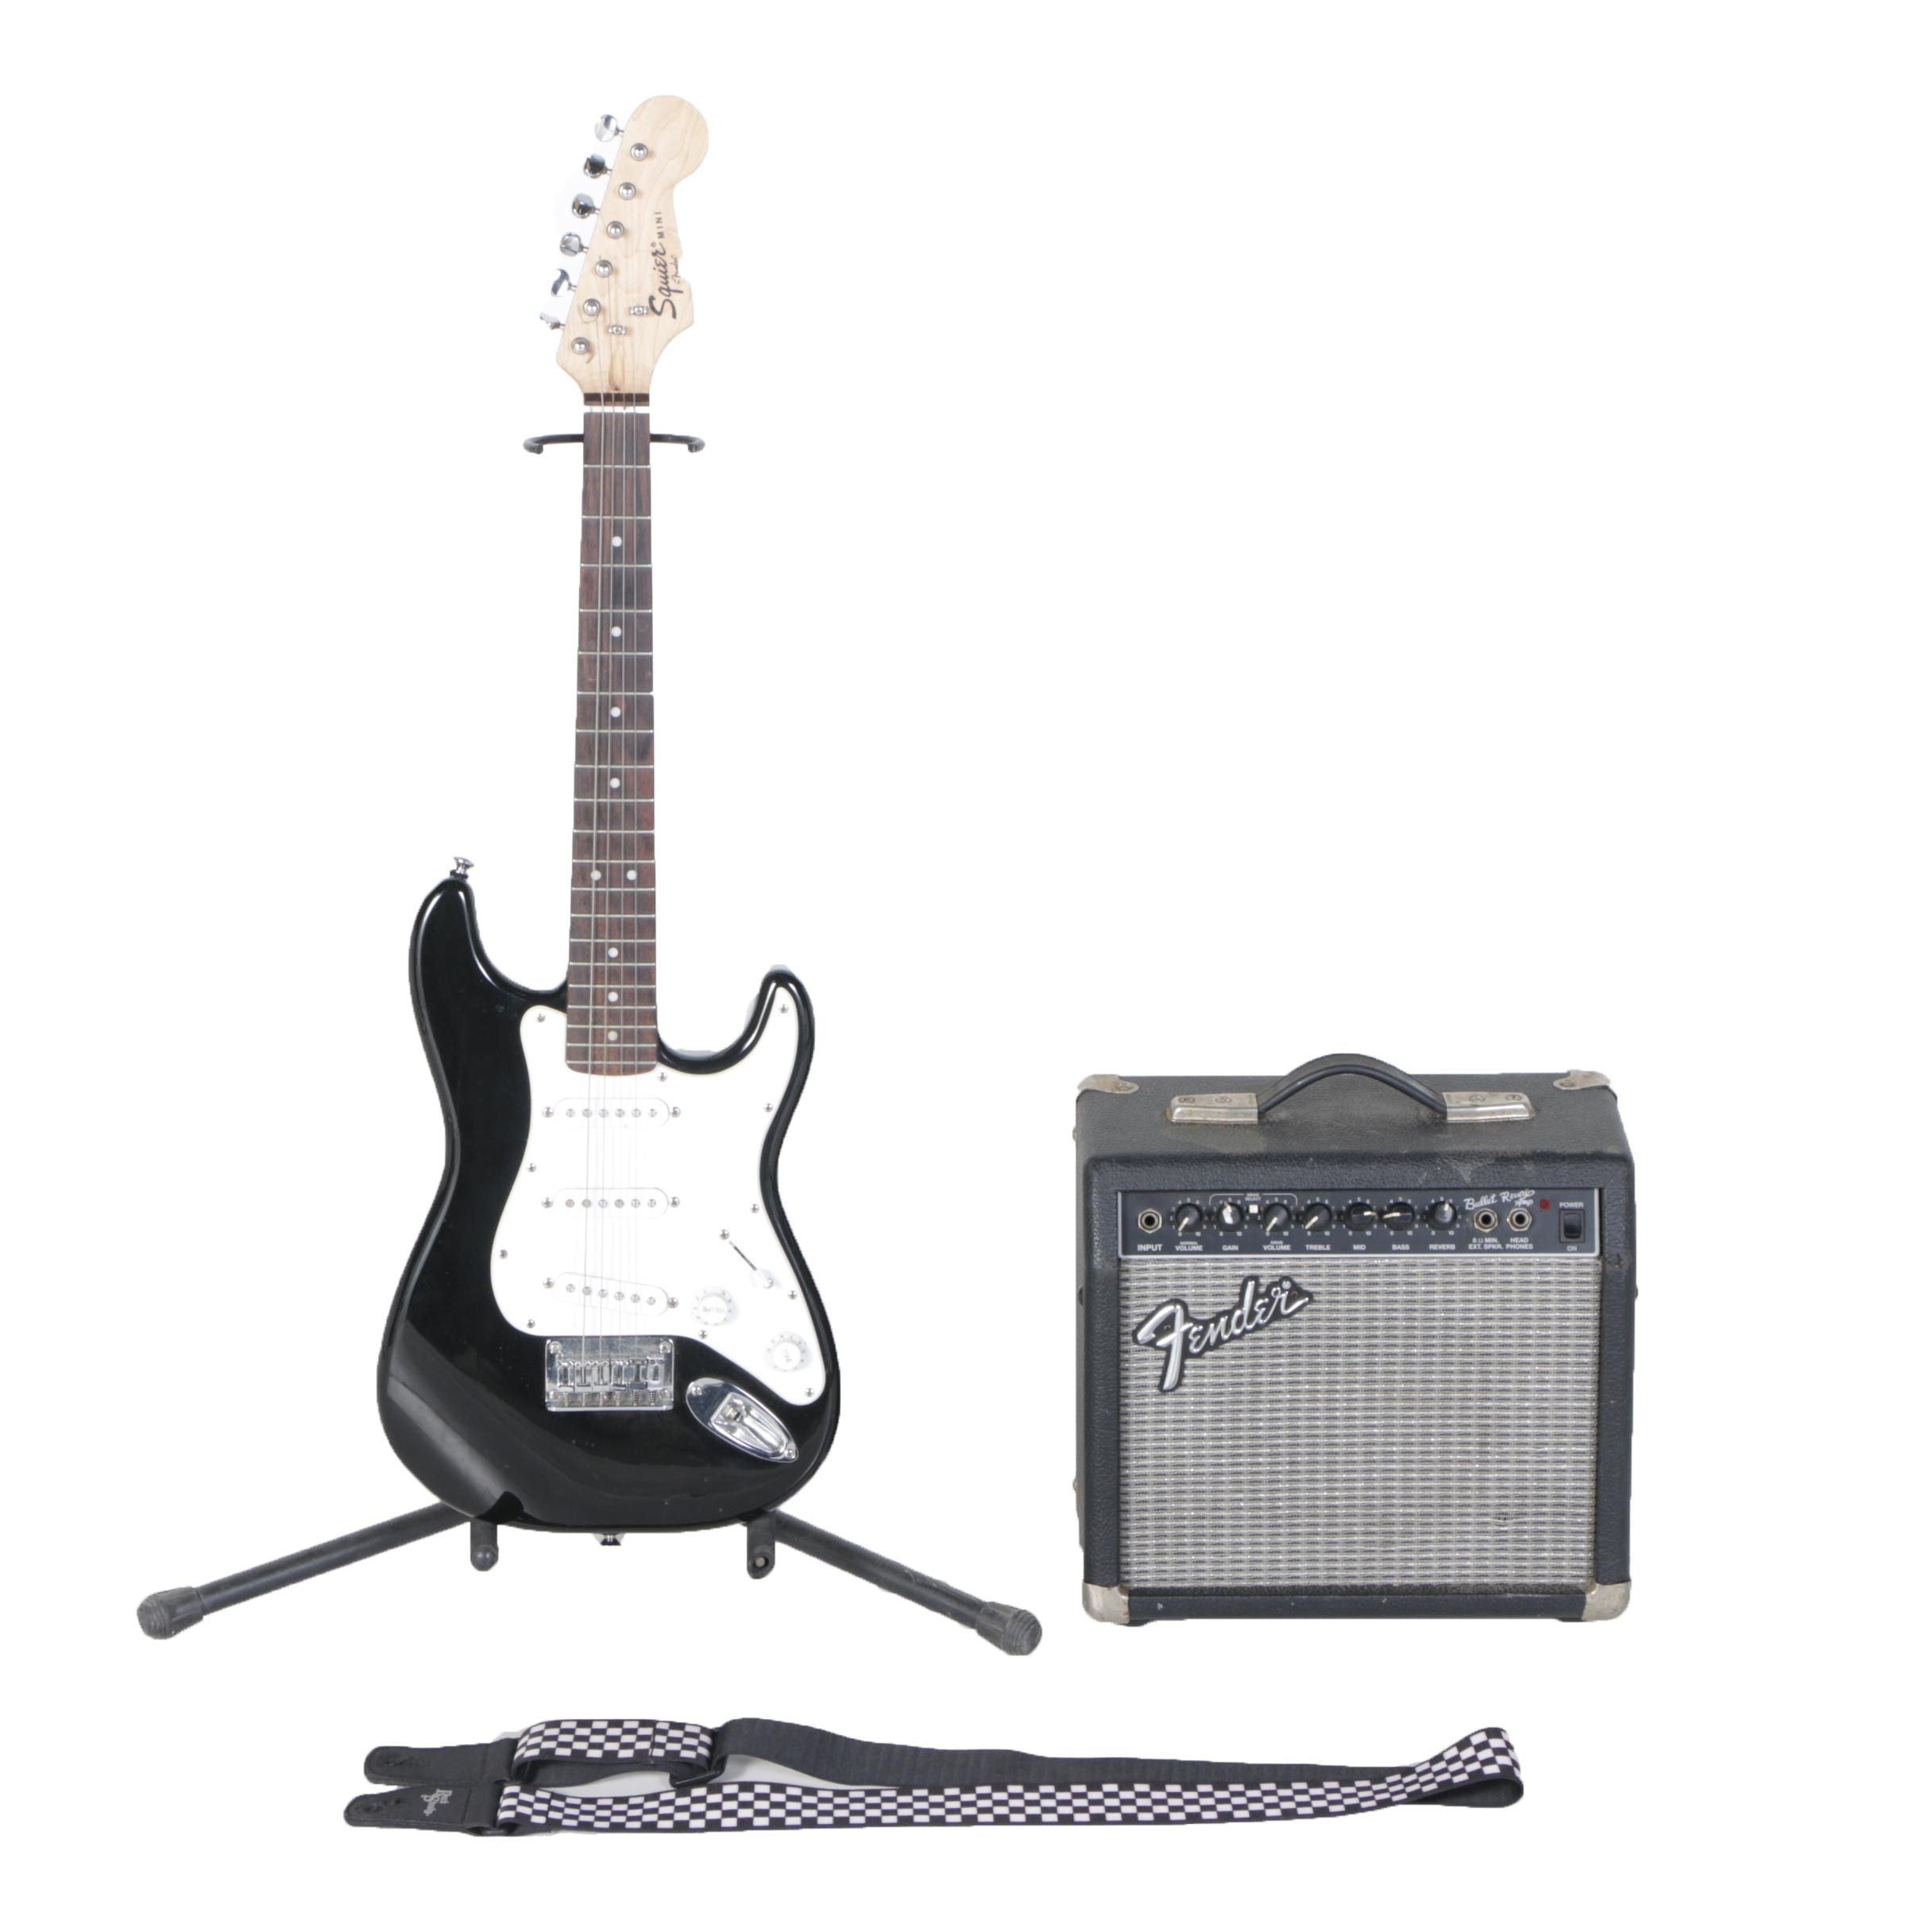 WRG-7489] Fender Squier Mini Wiring Diagram on squier tele special, squier bullet special, squier vintage modified stratocaster, squier telecaster bass special, squier precision bass special,